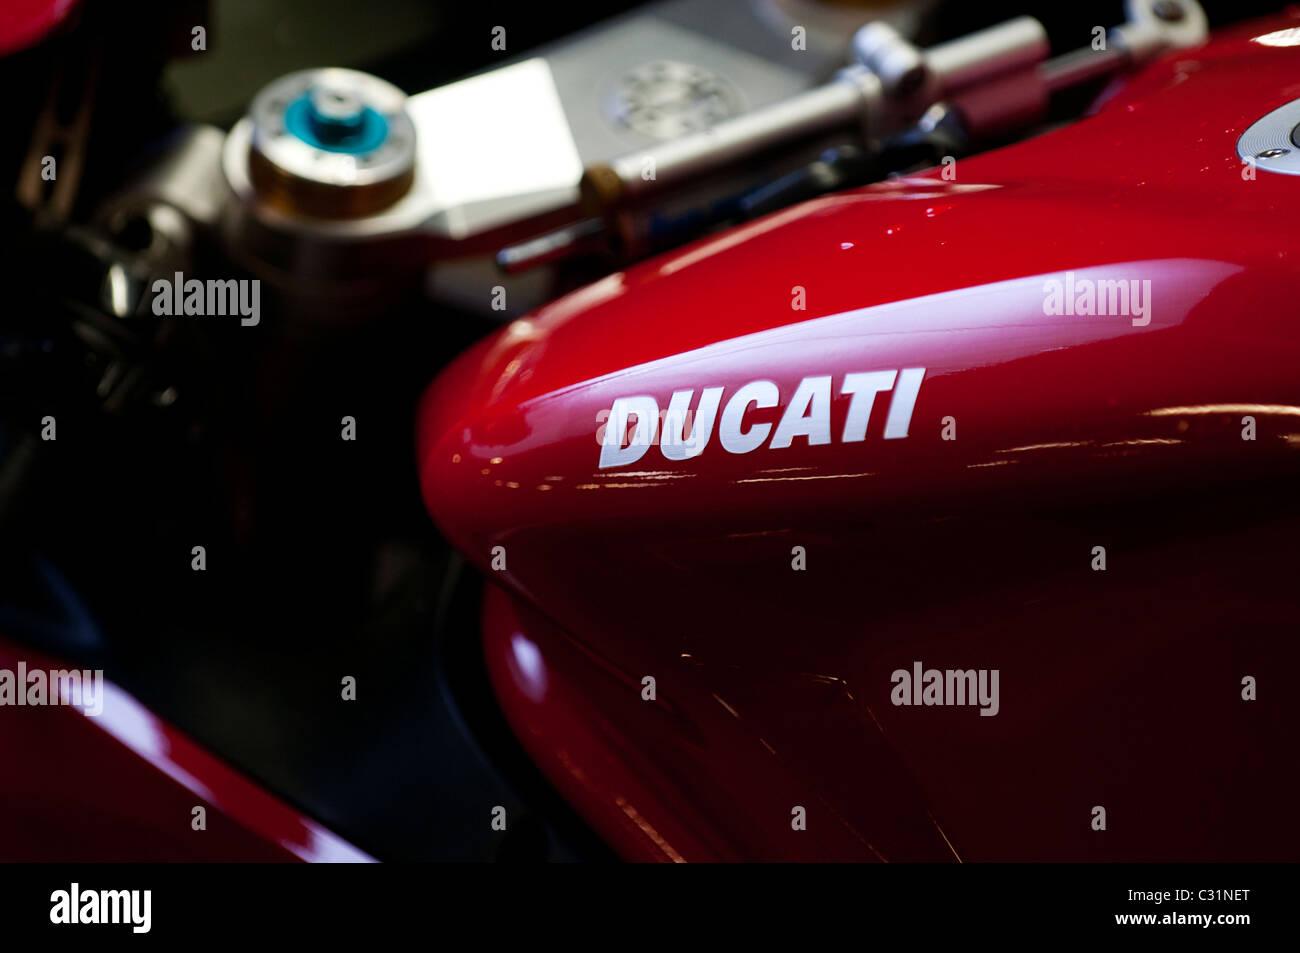 Ducati 1098s tank close up - Stock Image